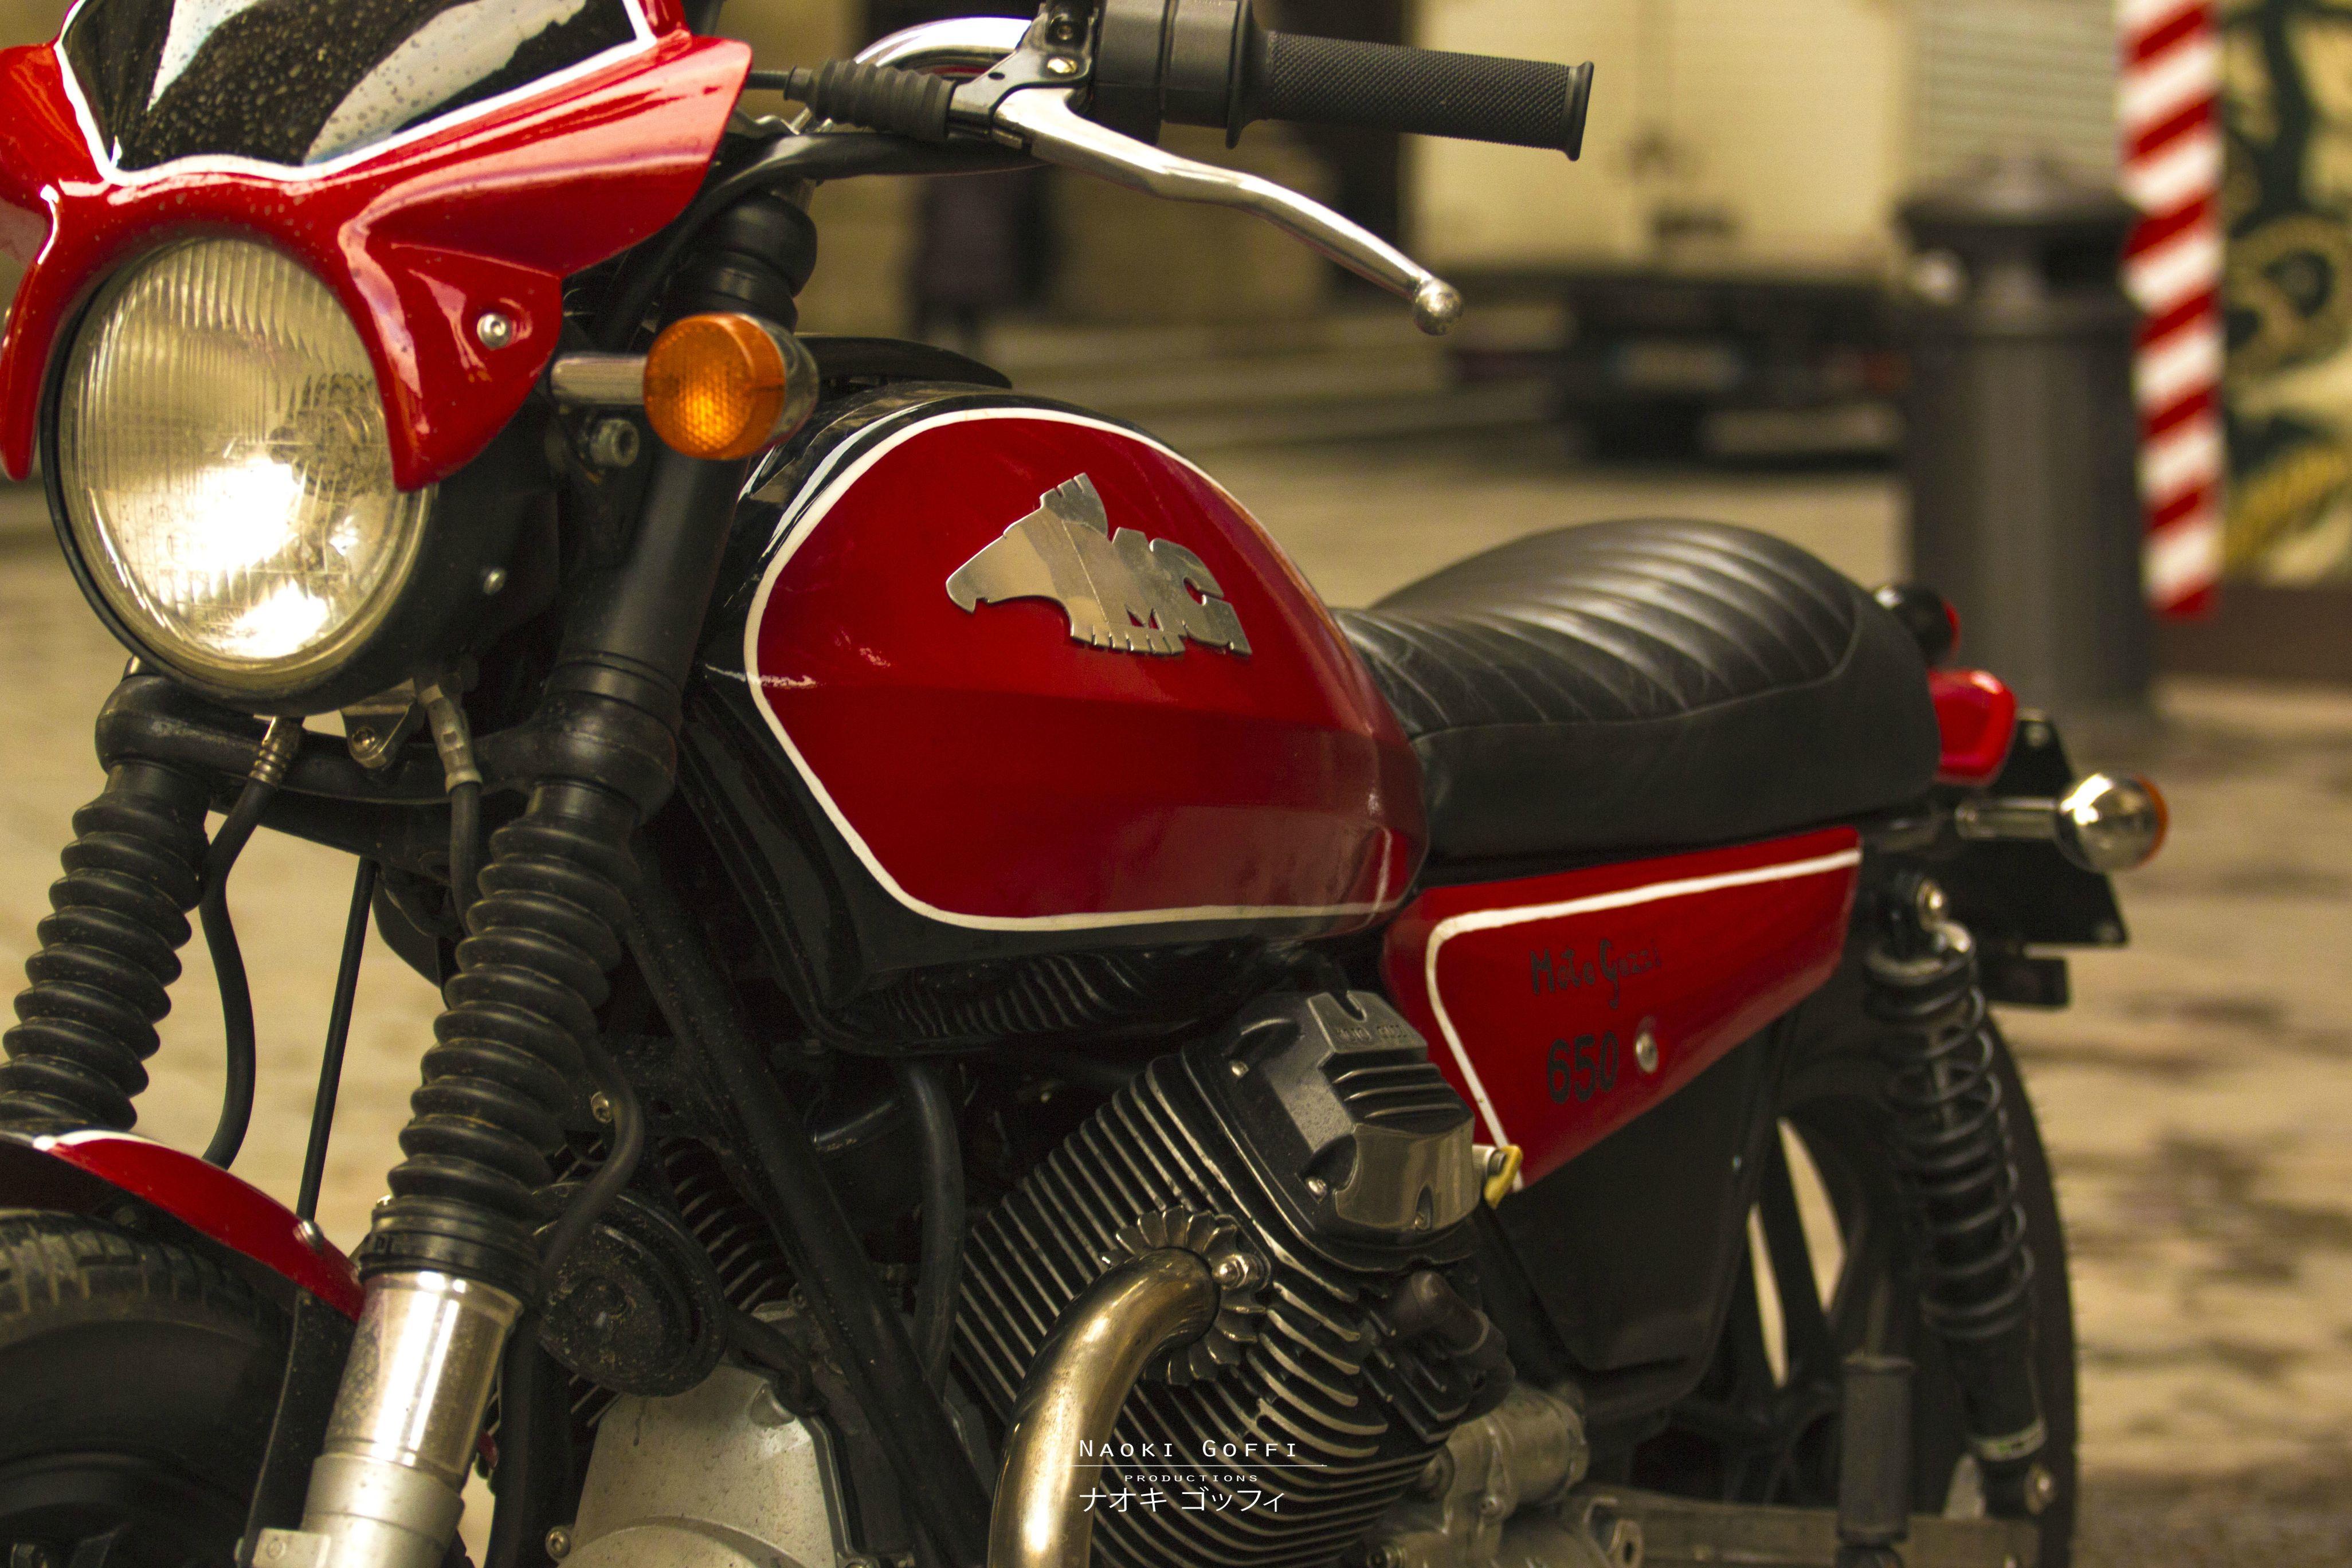 MotoGuzzi V65 by Fabio Goffi